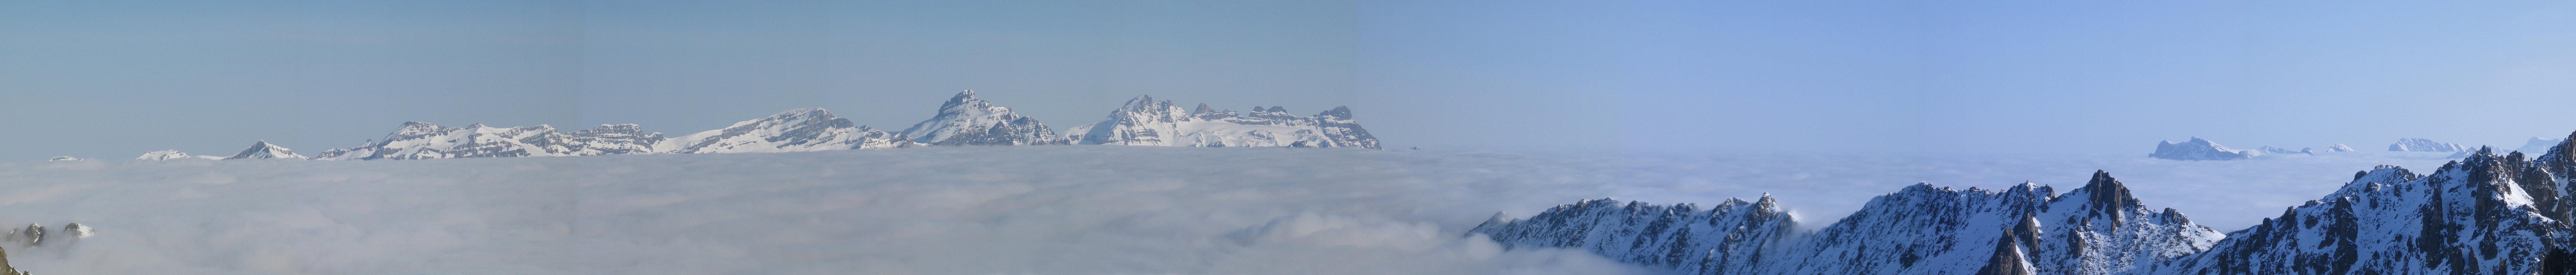 Val Arpette (Day2, H.R. Chamonix-Zermatt) Walliser Alpen / Alpes valaisannes Švýcarsko panorama 20